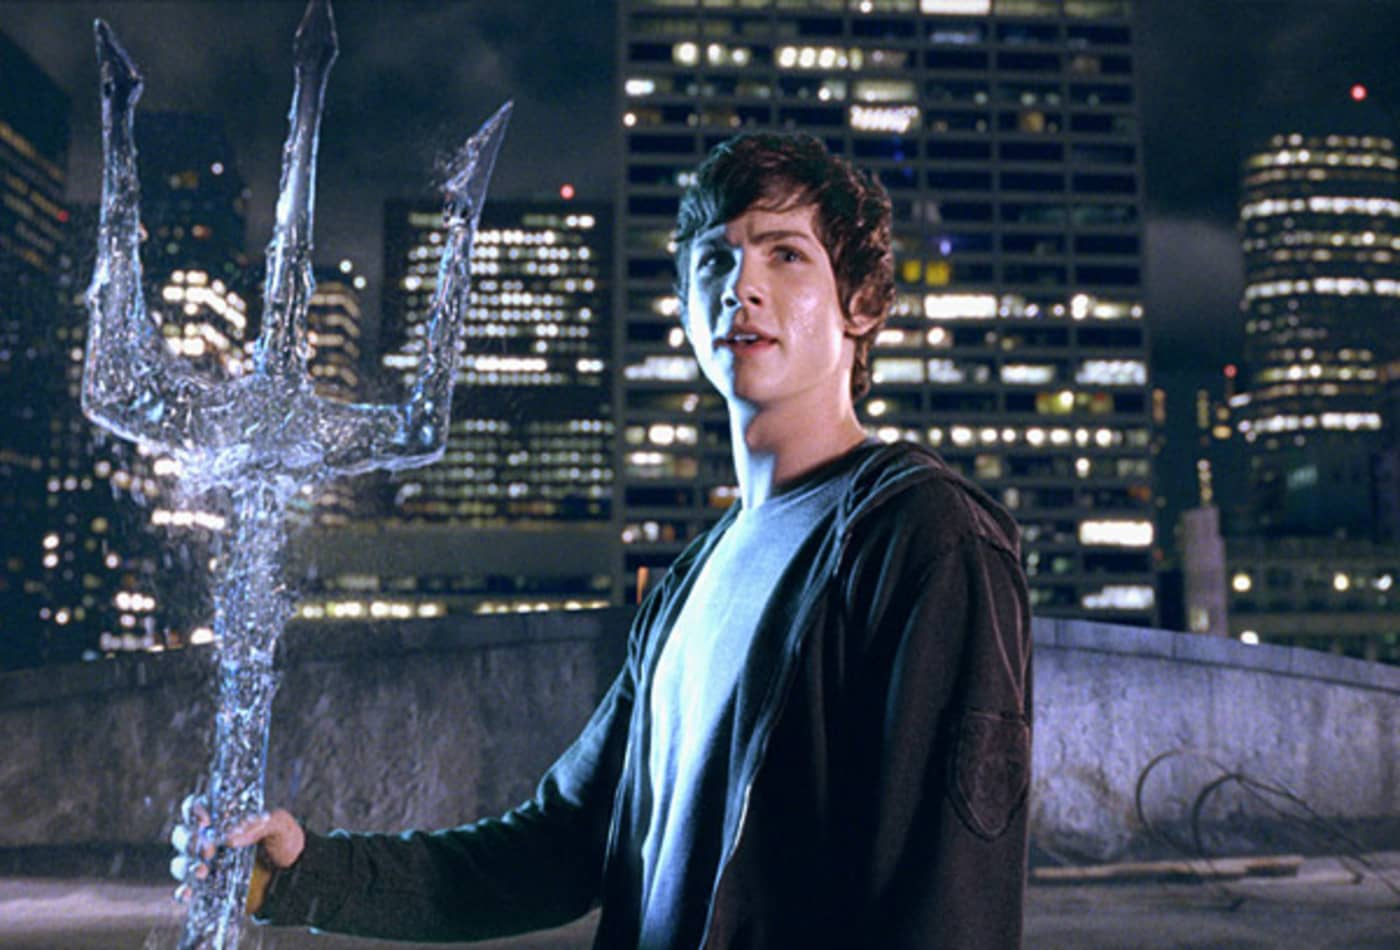 Percy-Jackson-Olympians-Highest-Grossing-Fantasy-Movies-CNBC.jpg